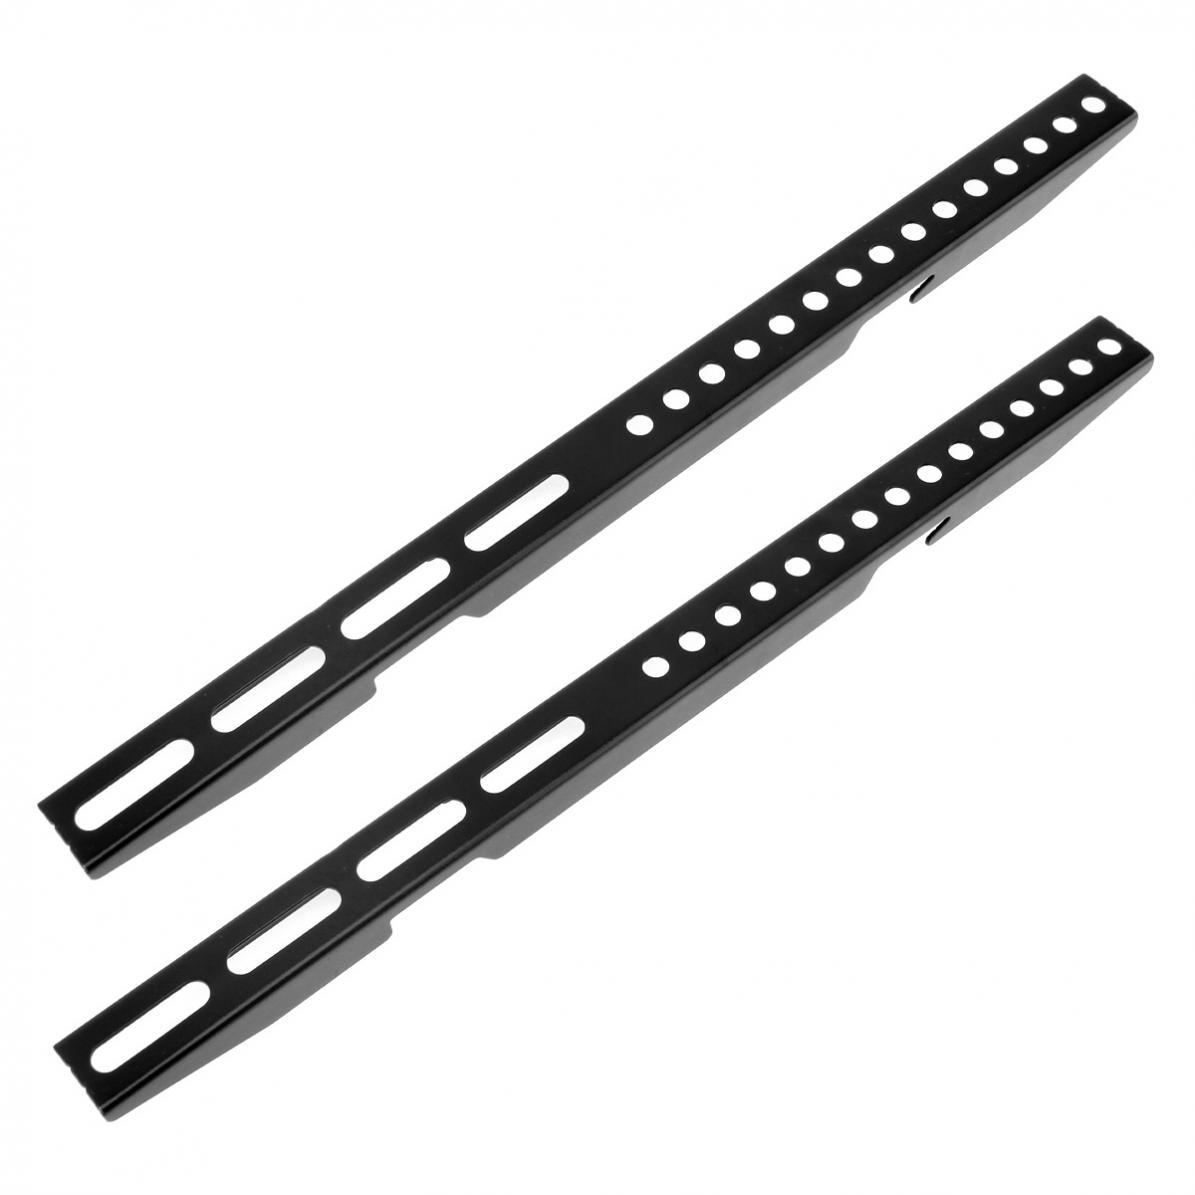 Sale Universal TV Wall Mount Bracket LCD LED Frame Holder for Most 26 ~ 55 Inch HDTV Flat Panel TV